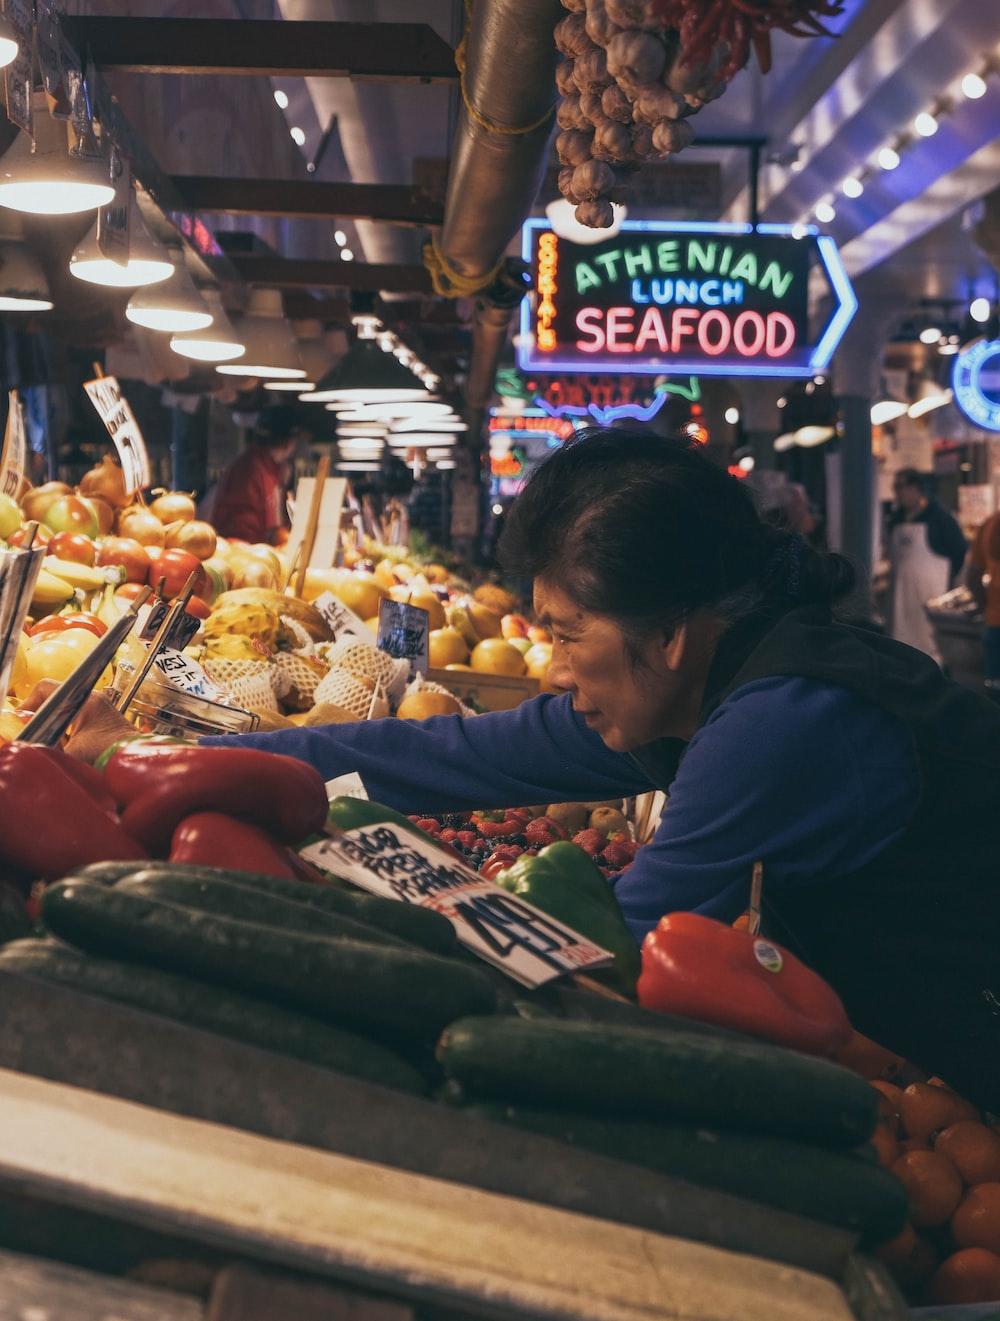 woman reaching vegetable